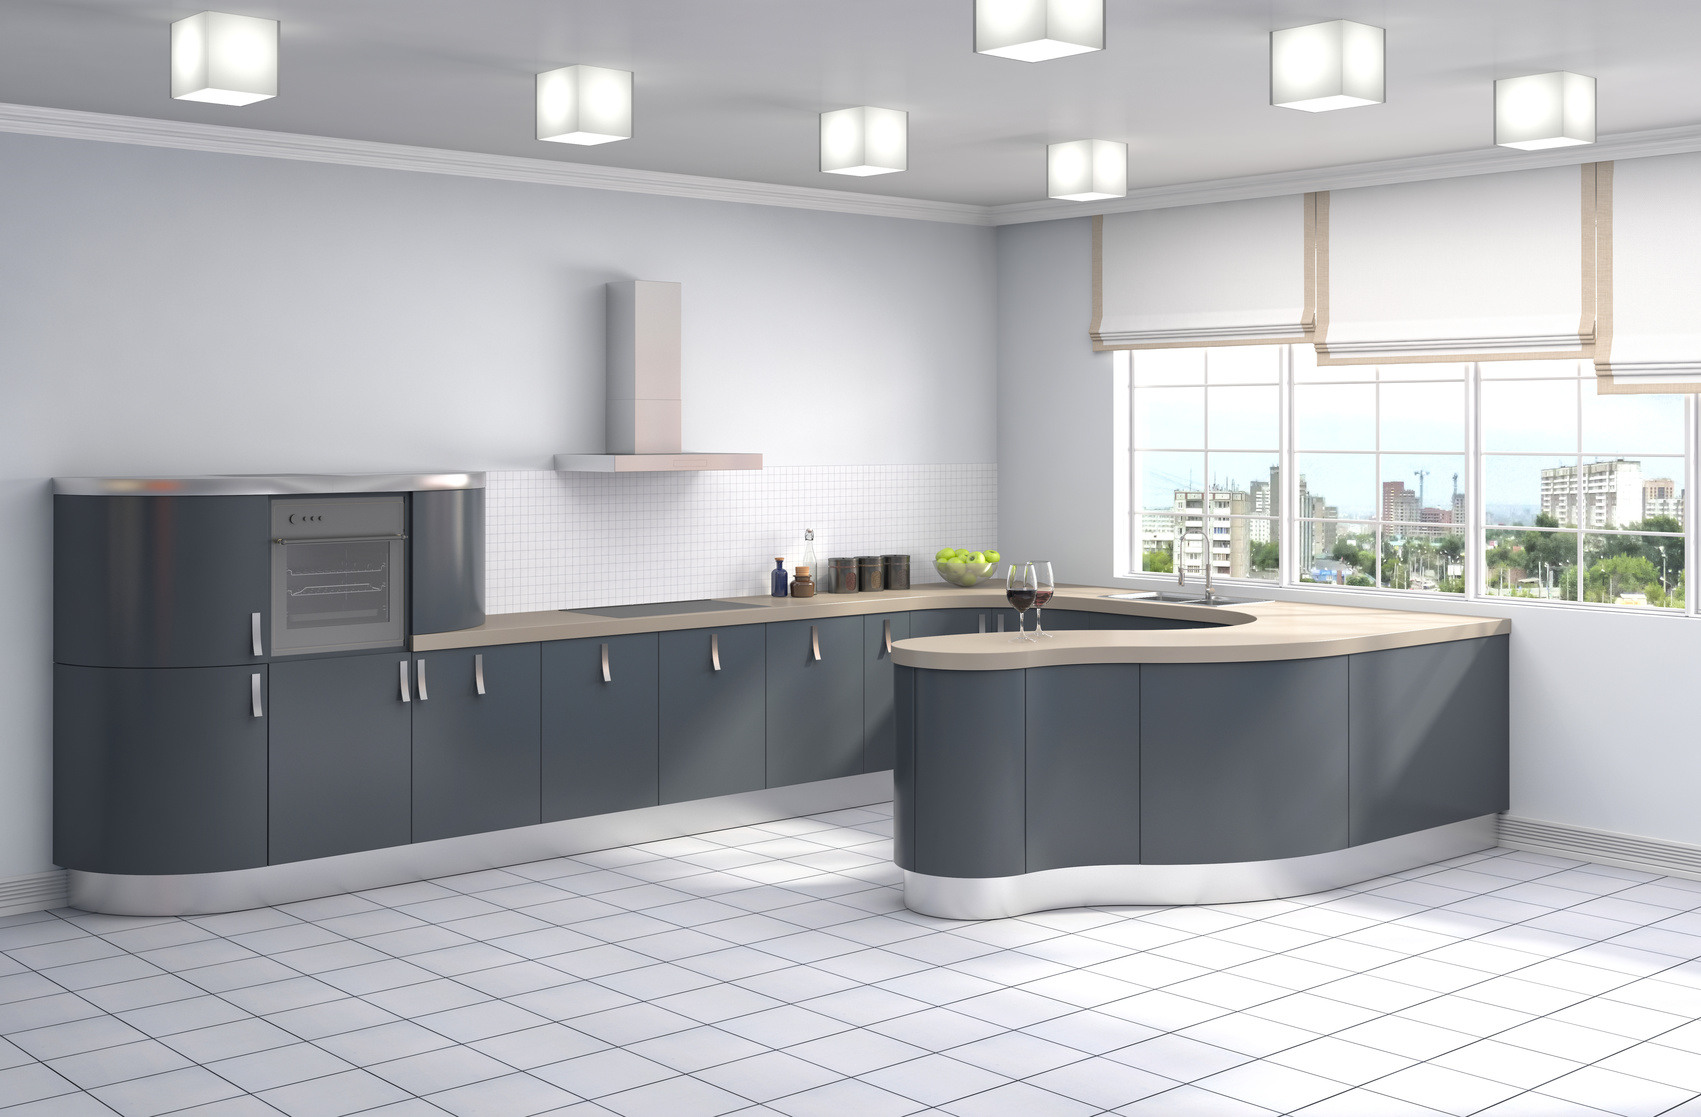 Beautiful Küche Mit Küchenblock Contemporary - Ridgewayng.com ...